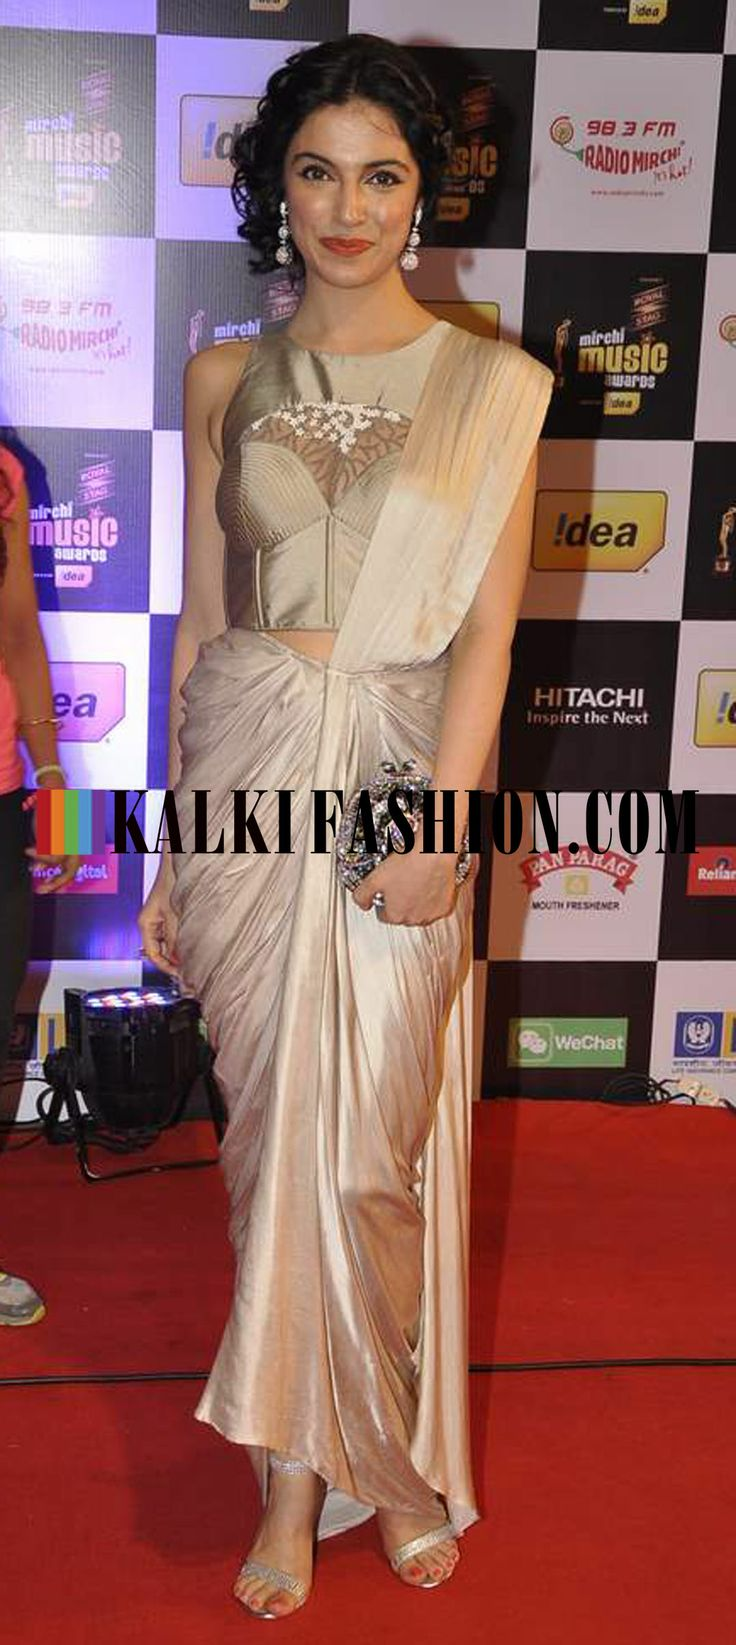 http://www.kalkifashion.com/ Divya Kumar Khosla walked the red carpet of Mirchi Music Award 2014 in Sonaakshi Raaj saree gown